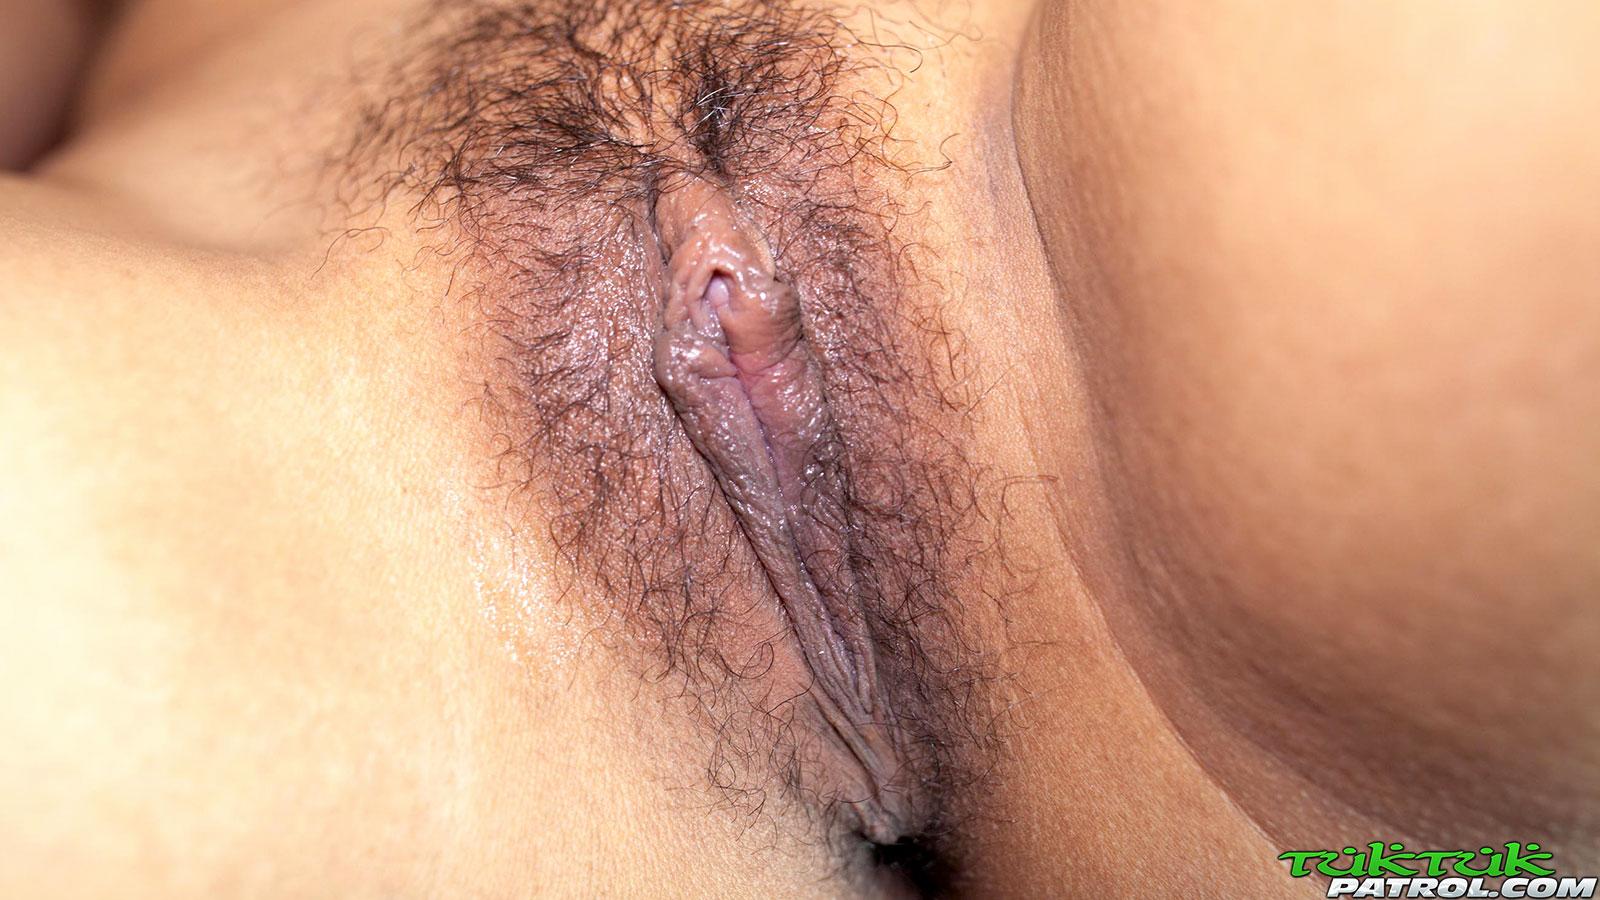 asian-hairy-pussy-close-ups